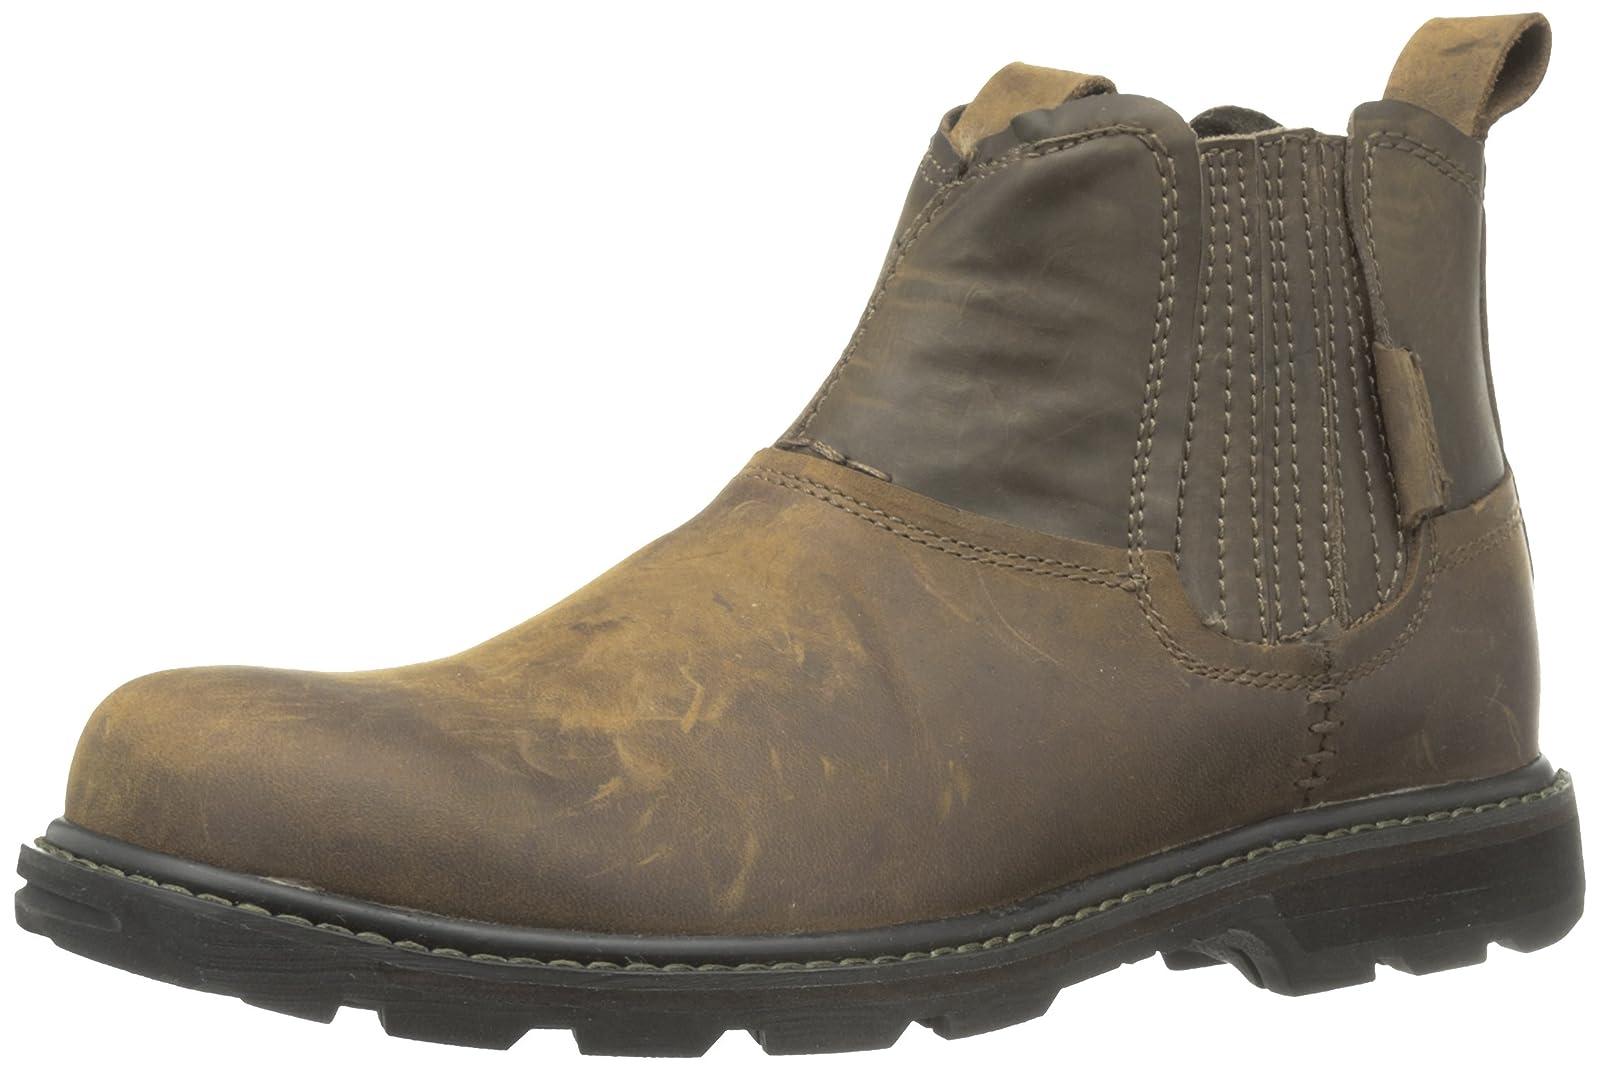 Skechers USA Men's Blaine Orsen Ankle Boot Dark Brown - 1